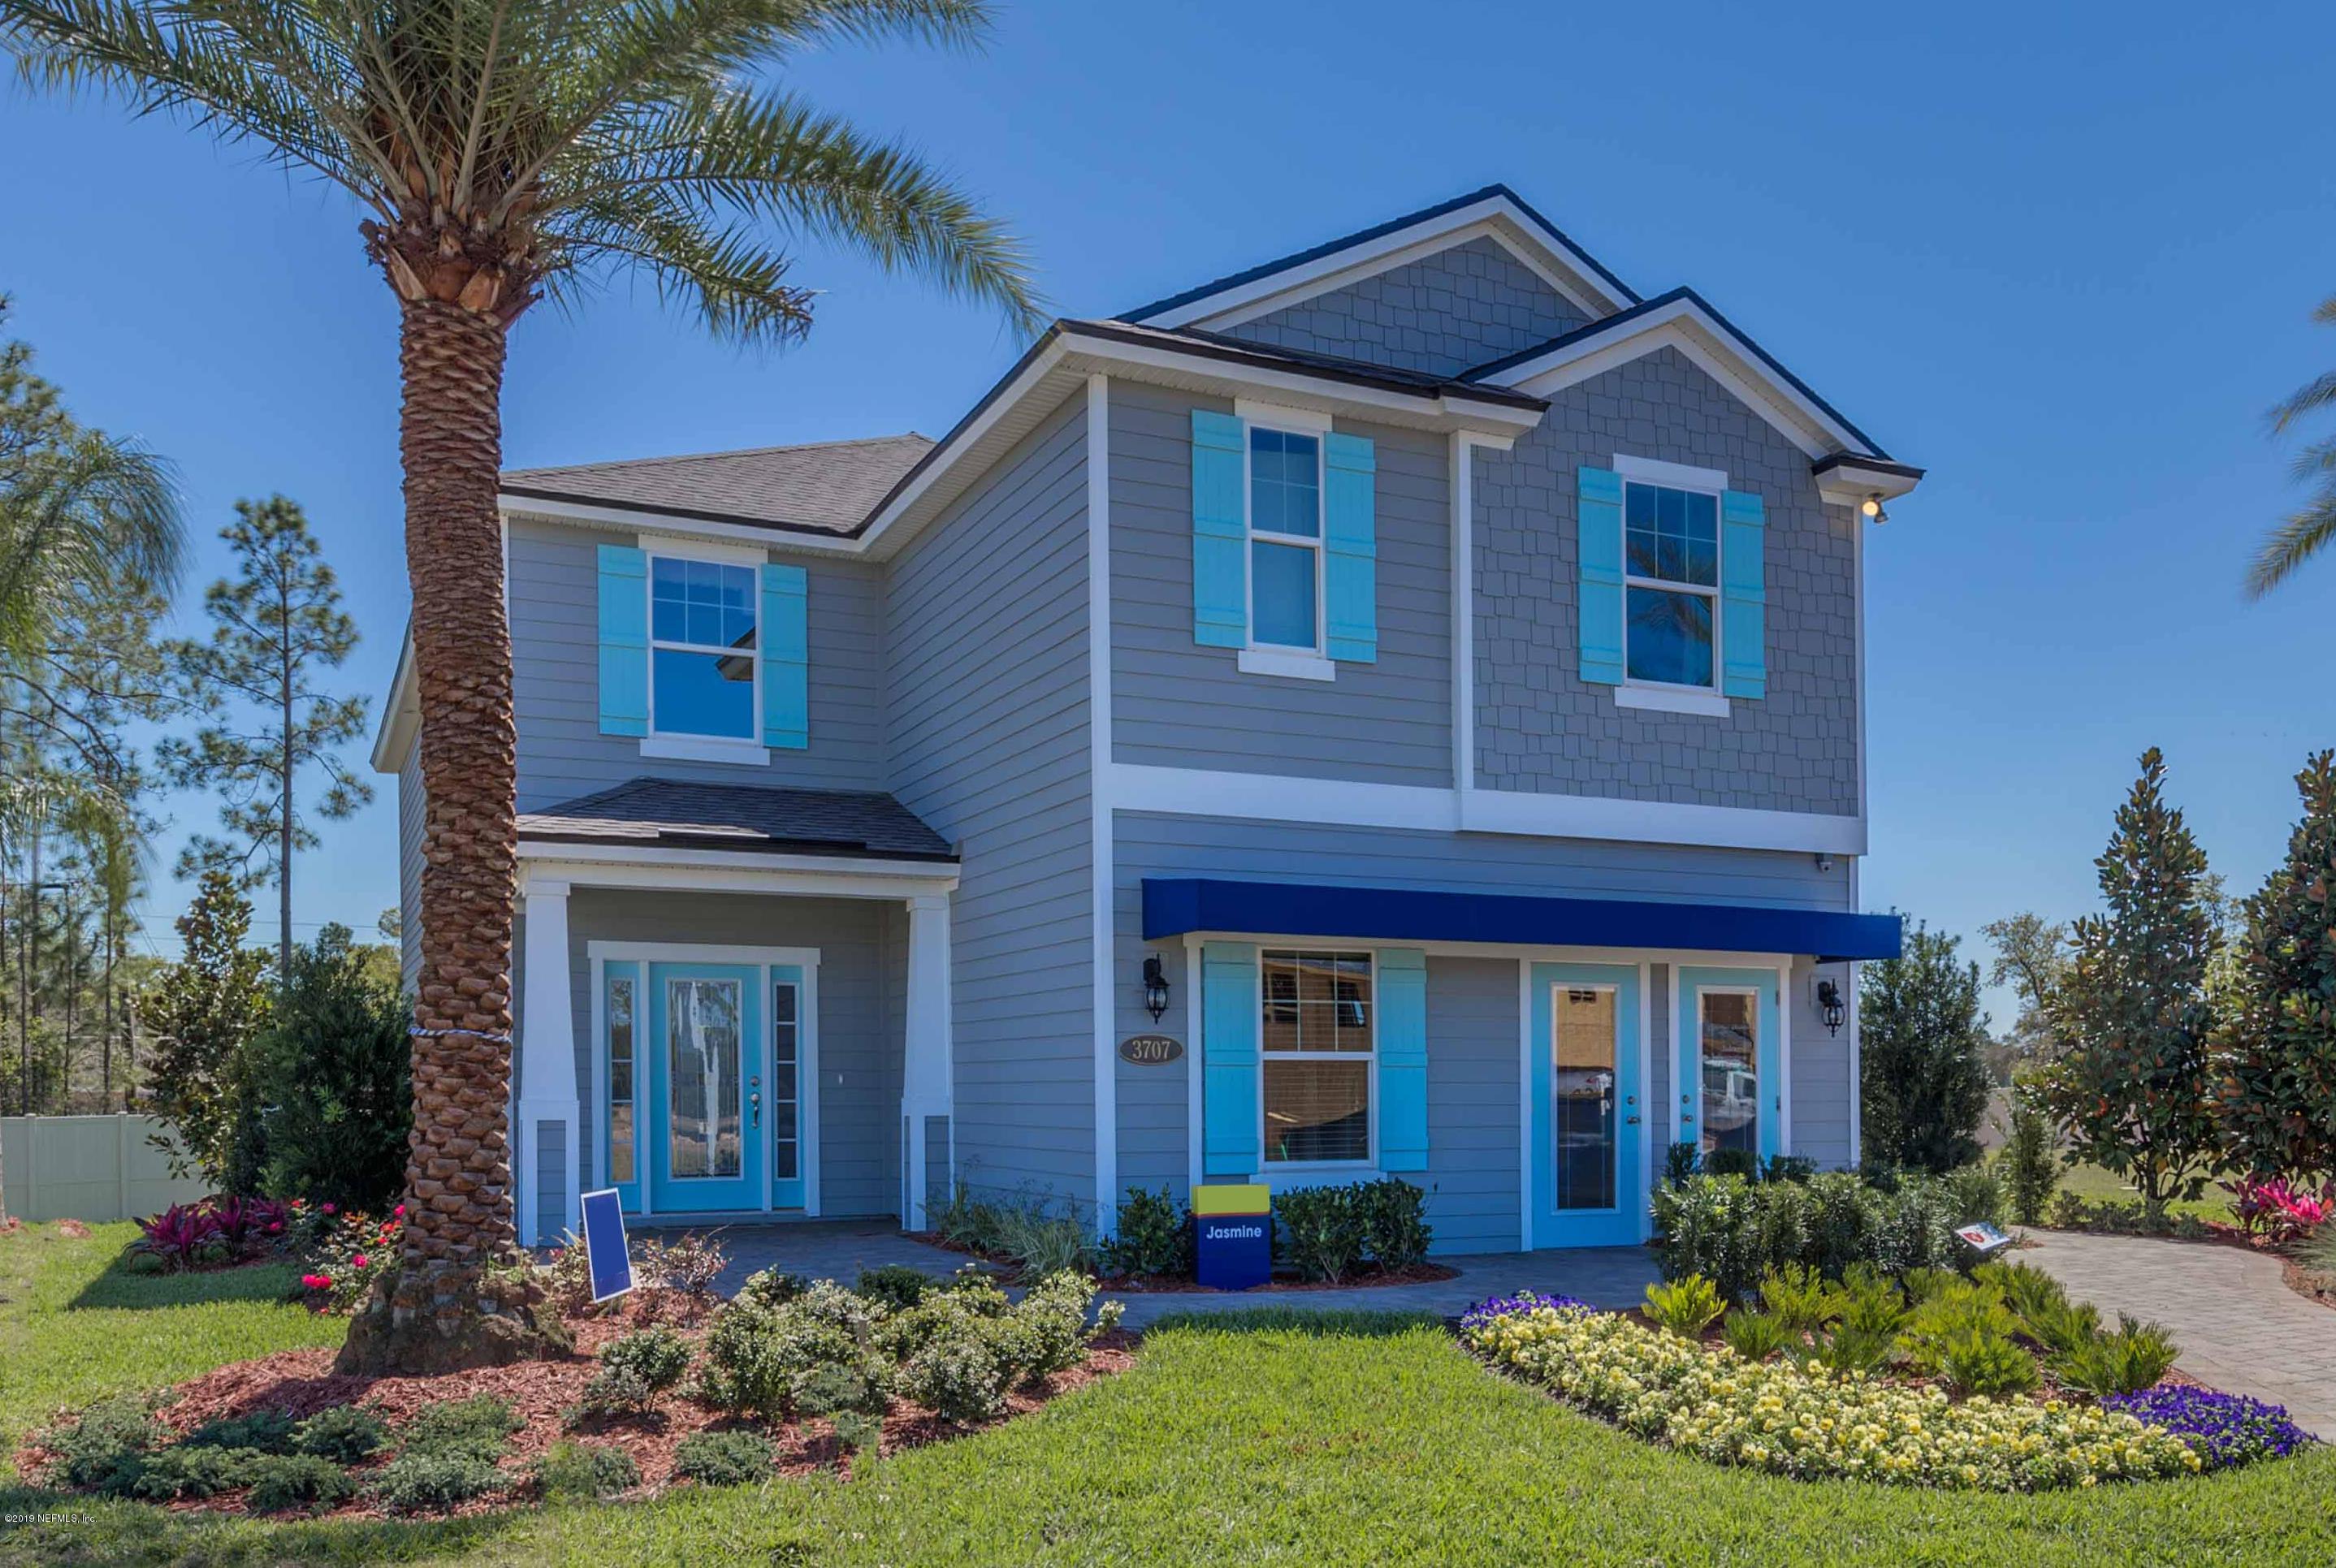 3707 Coastal Cove Cir Jacksonville, FL 32224